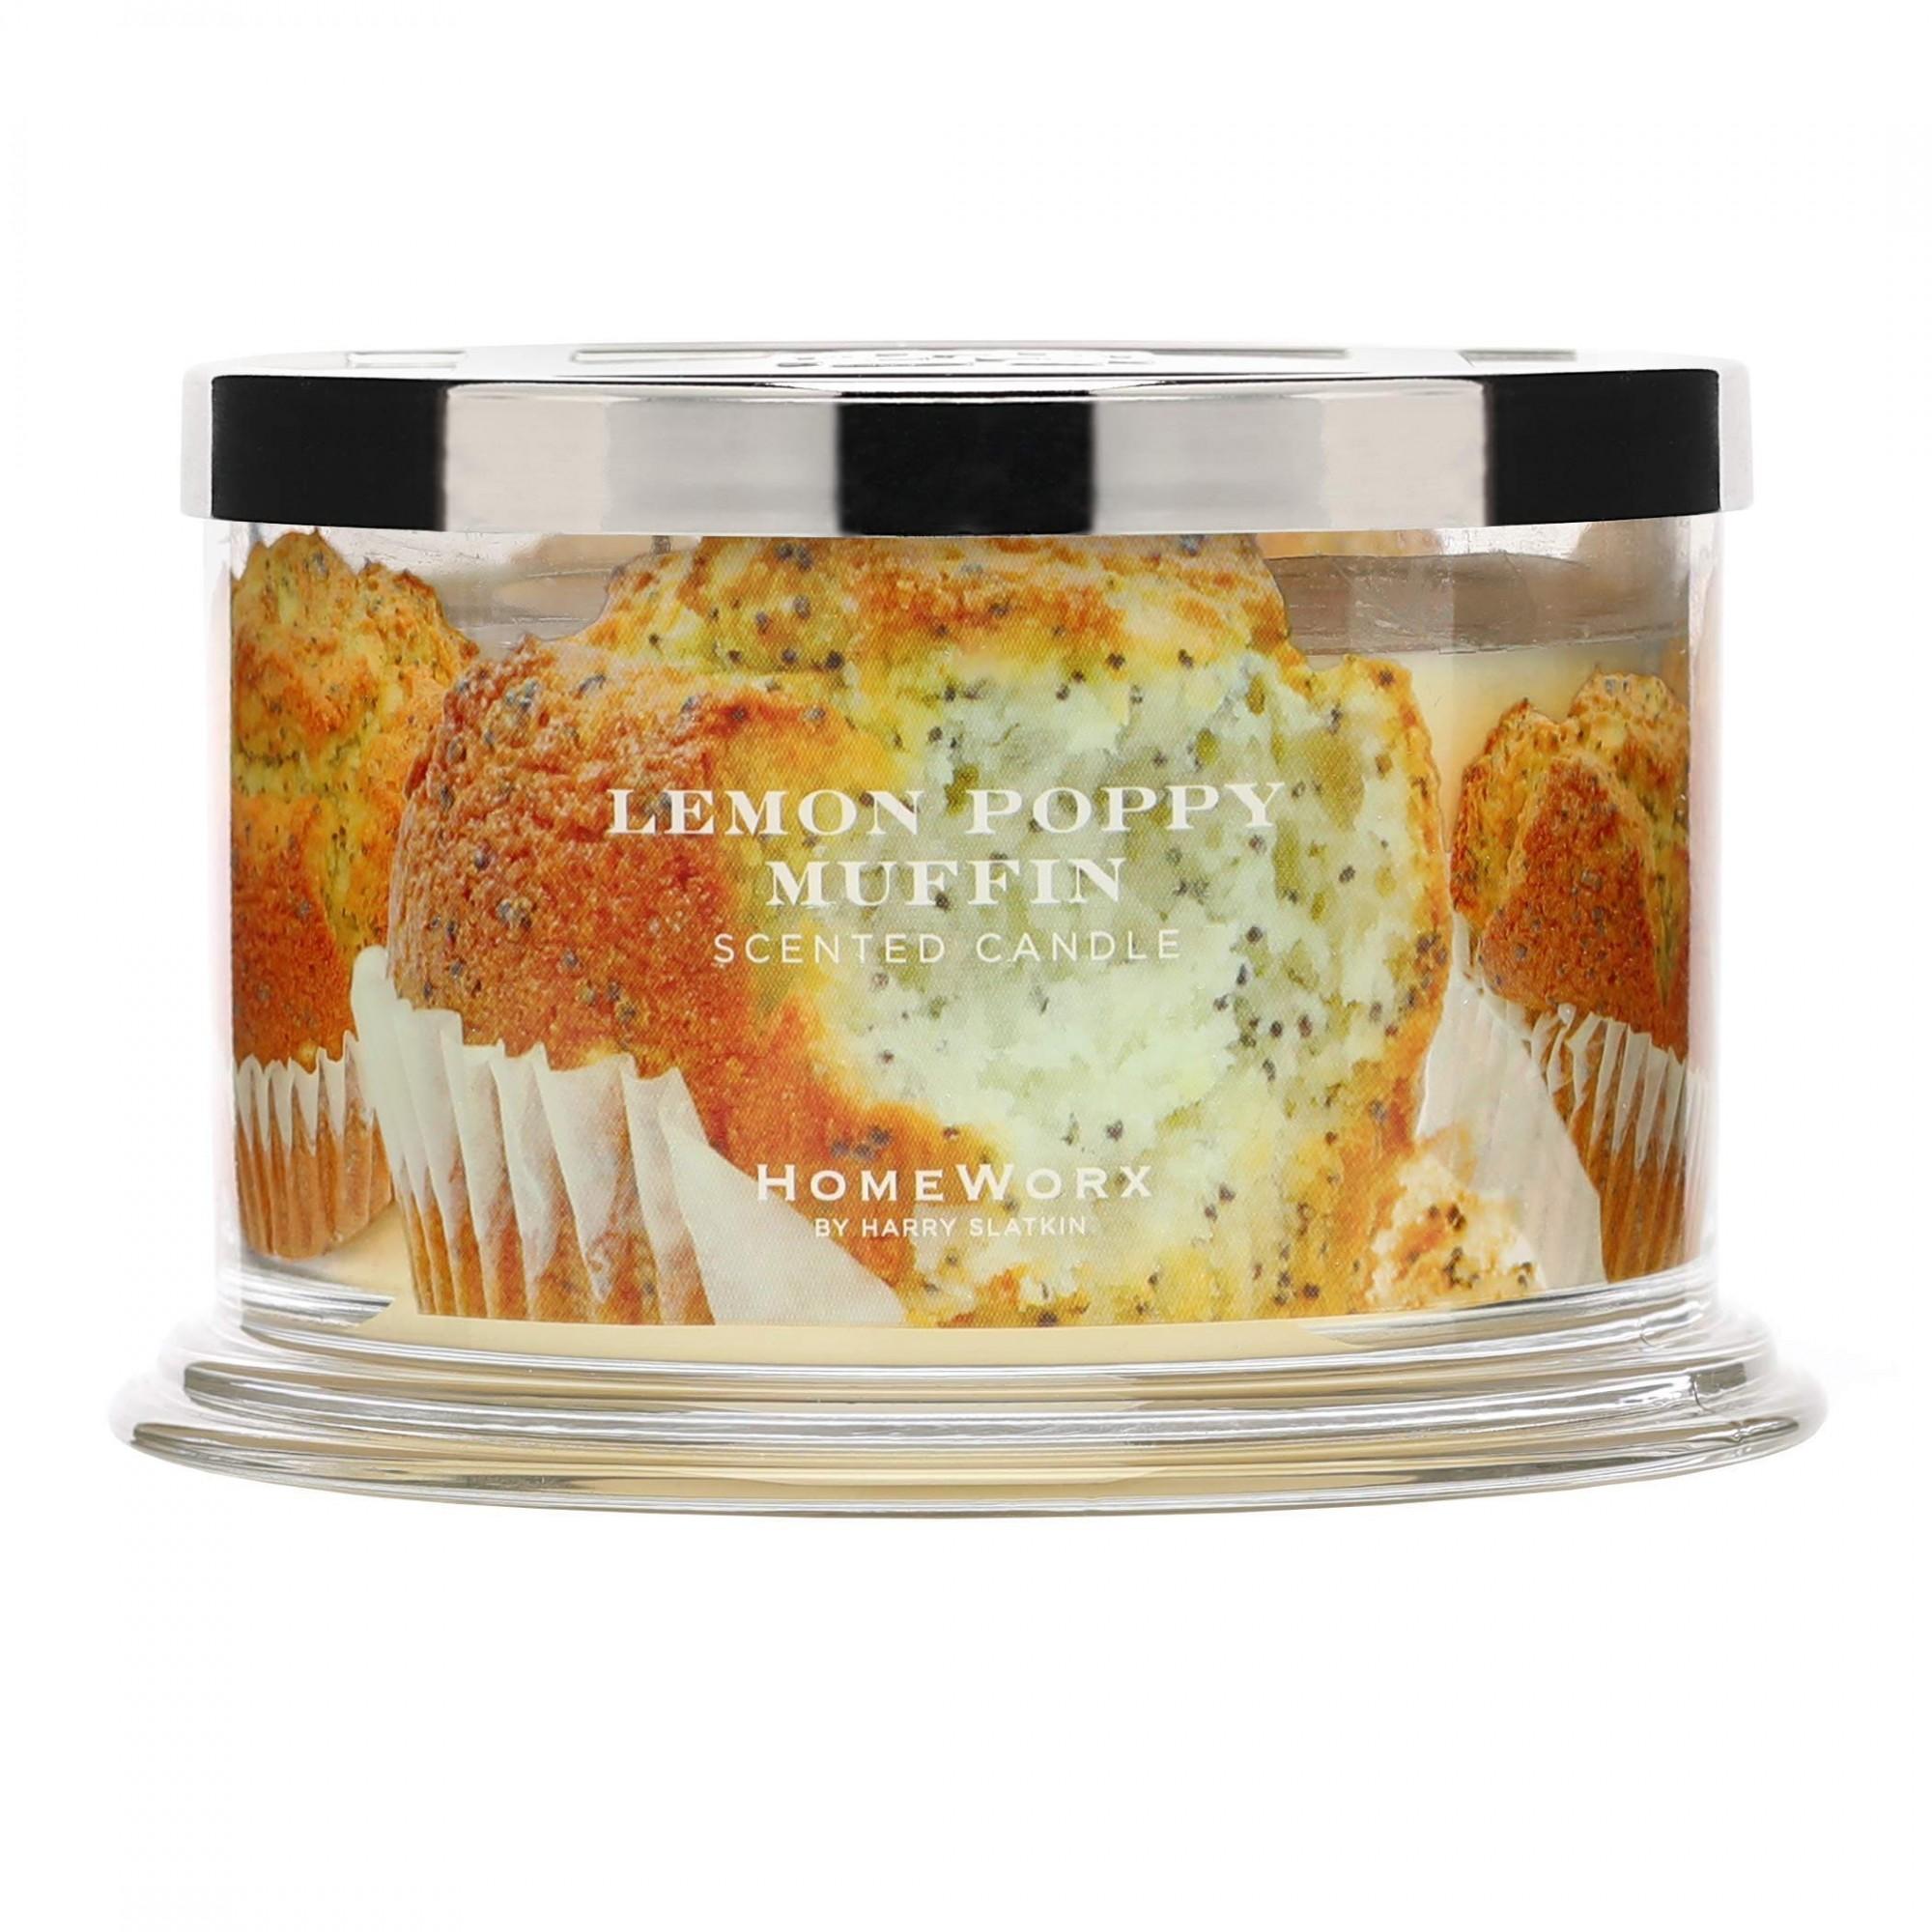 Homeworx by Harry Slatkin Lemon Poppy Muffin 4 Wick Candle